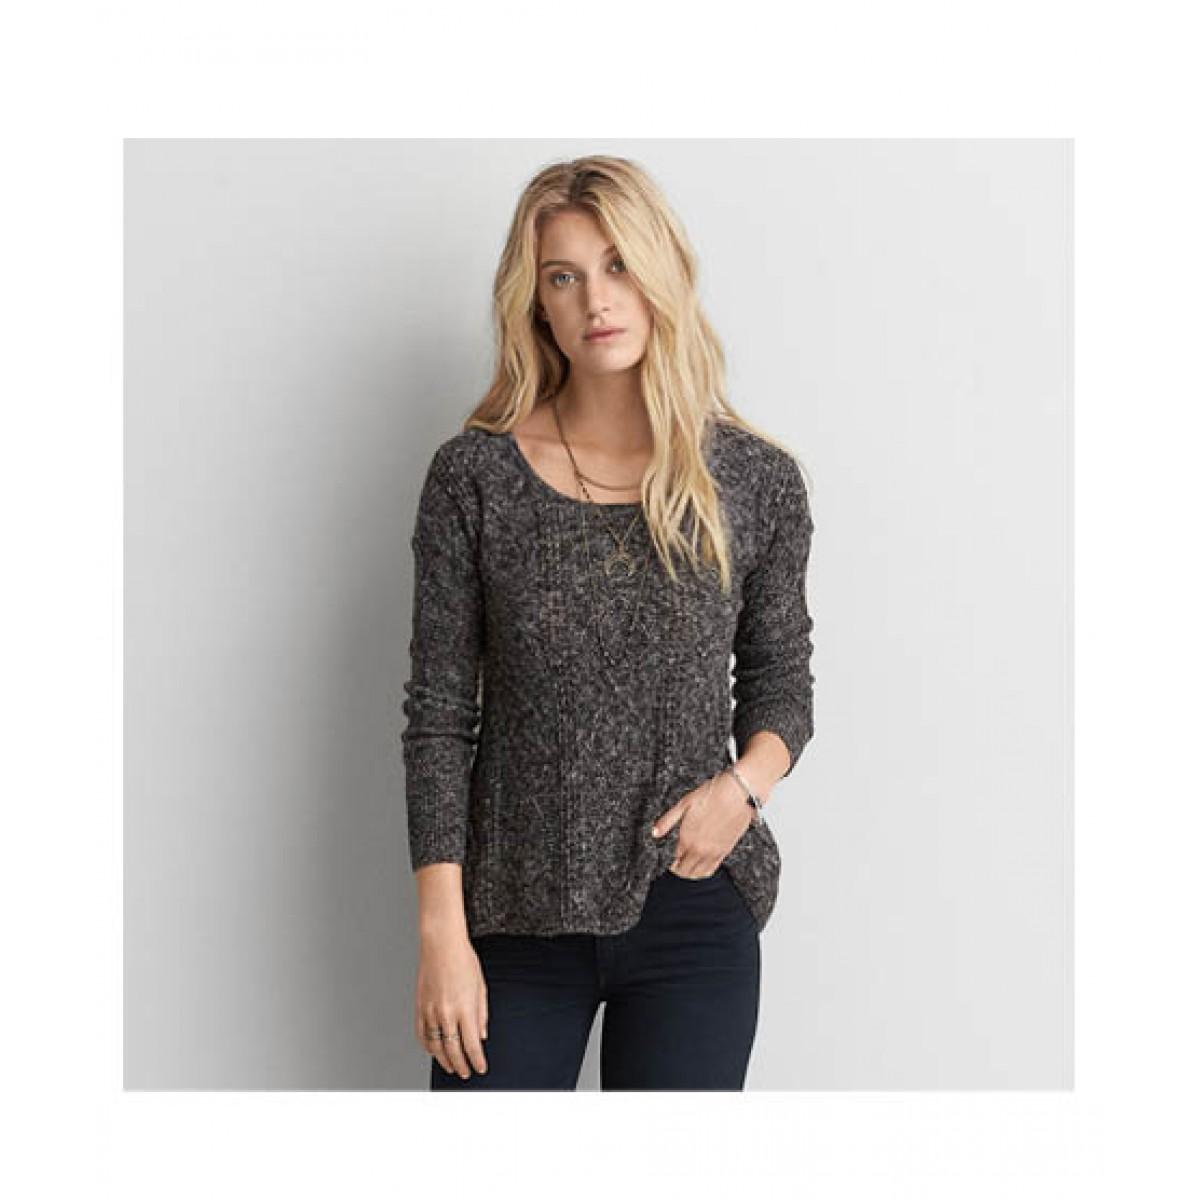 da702bdf0a906 American Eagle AEO Jegging Women's Sweater Price in Pakistan | Buy American  Eagle Textured Sweater Charcoal | iShopping.pk